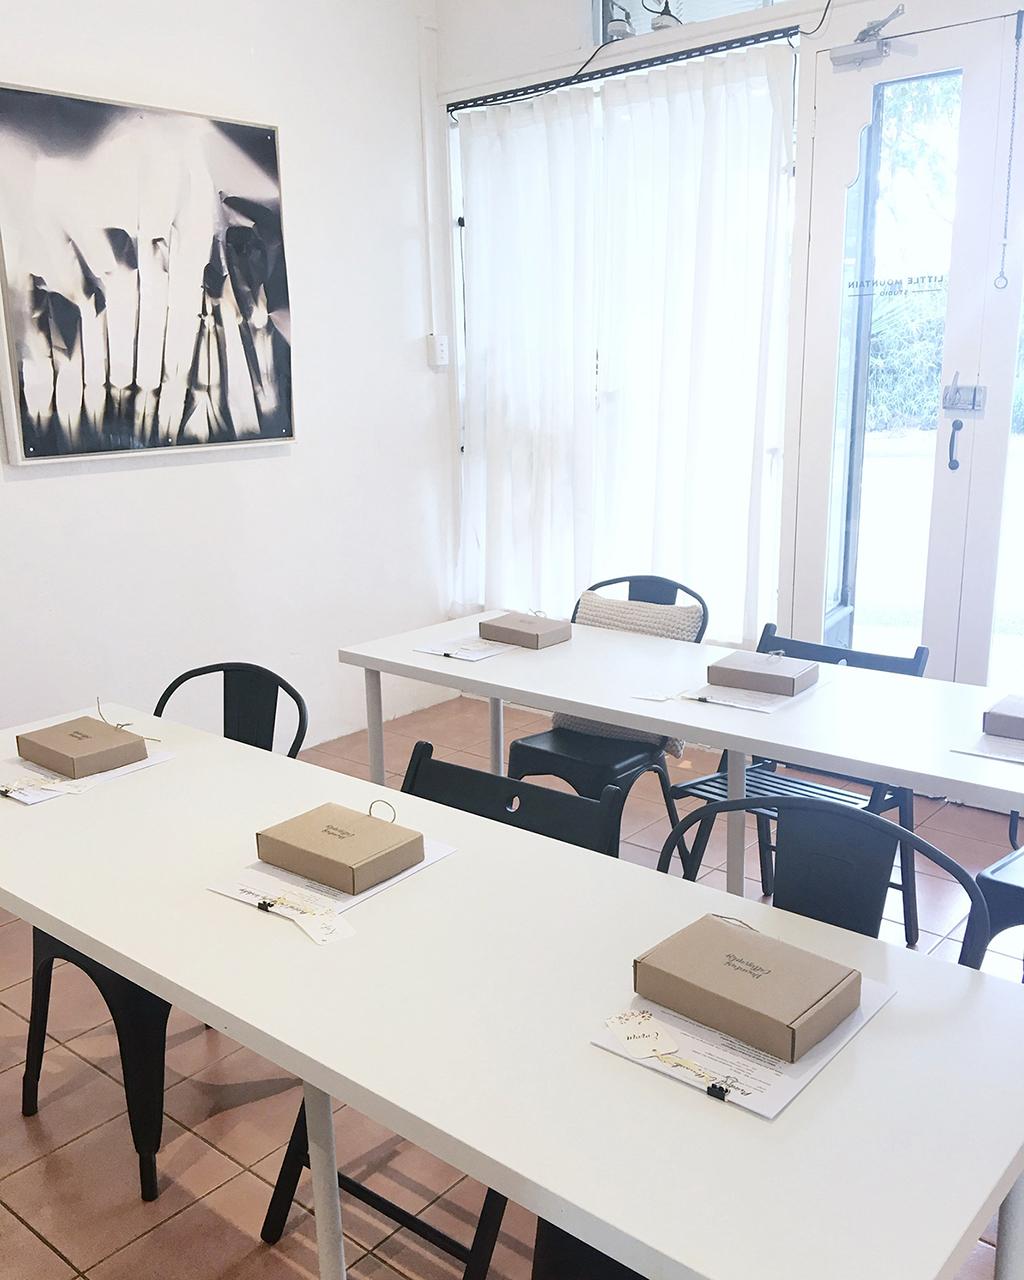 pixeldust calligraphy brisbane workshop